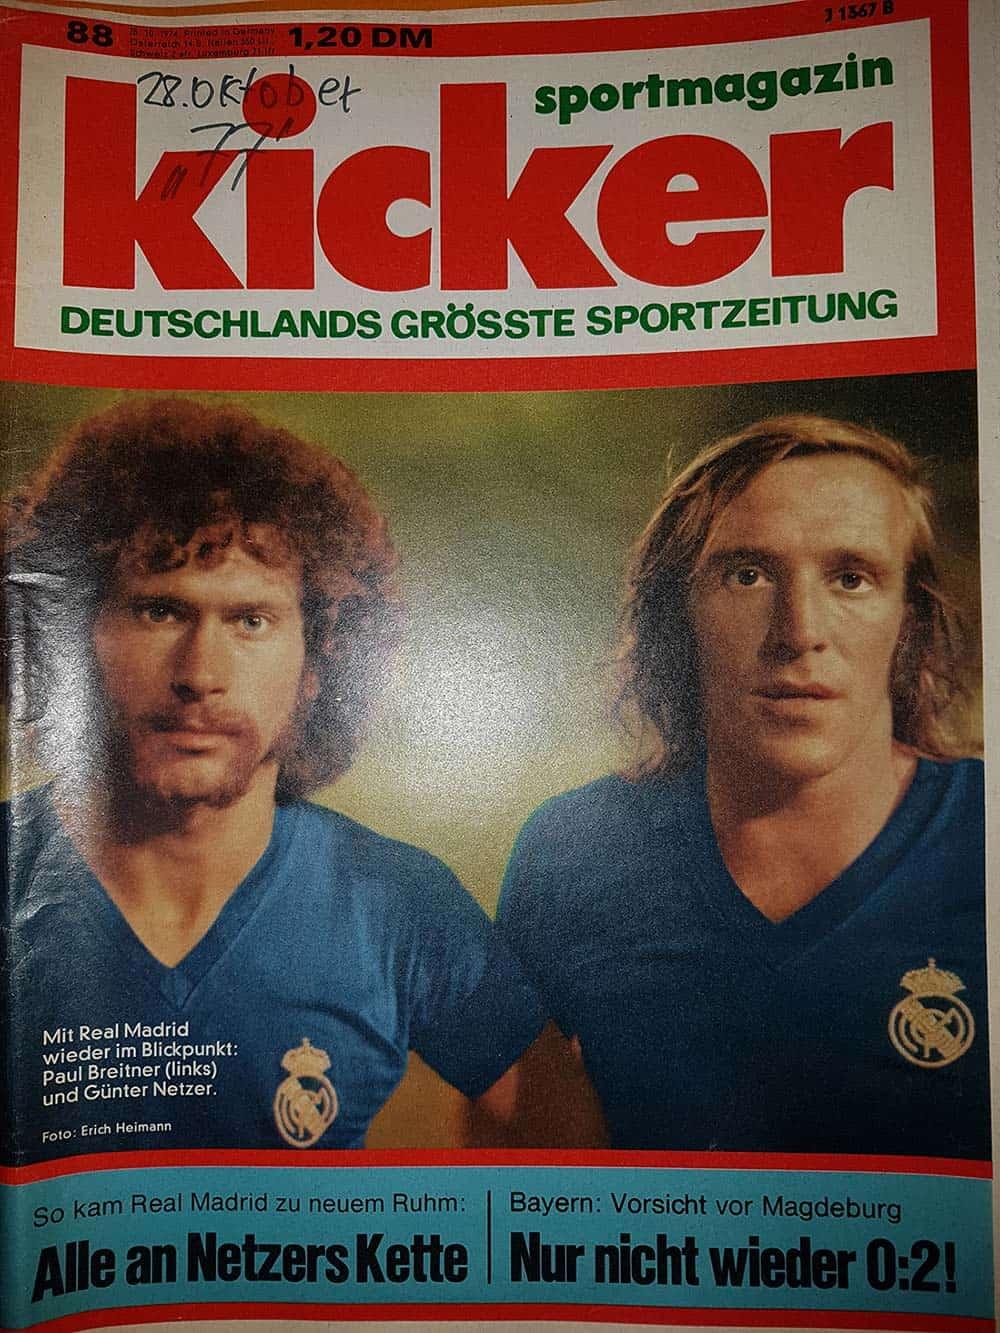 Sportmagazin Kicker Zeitung